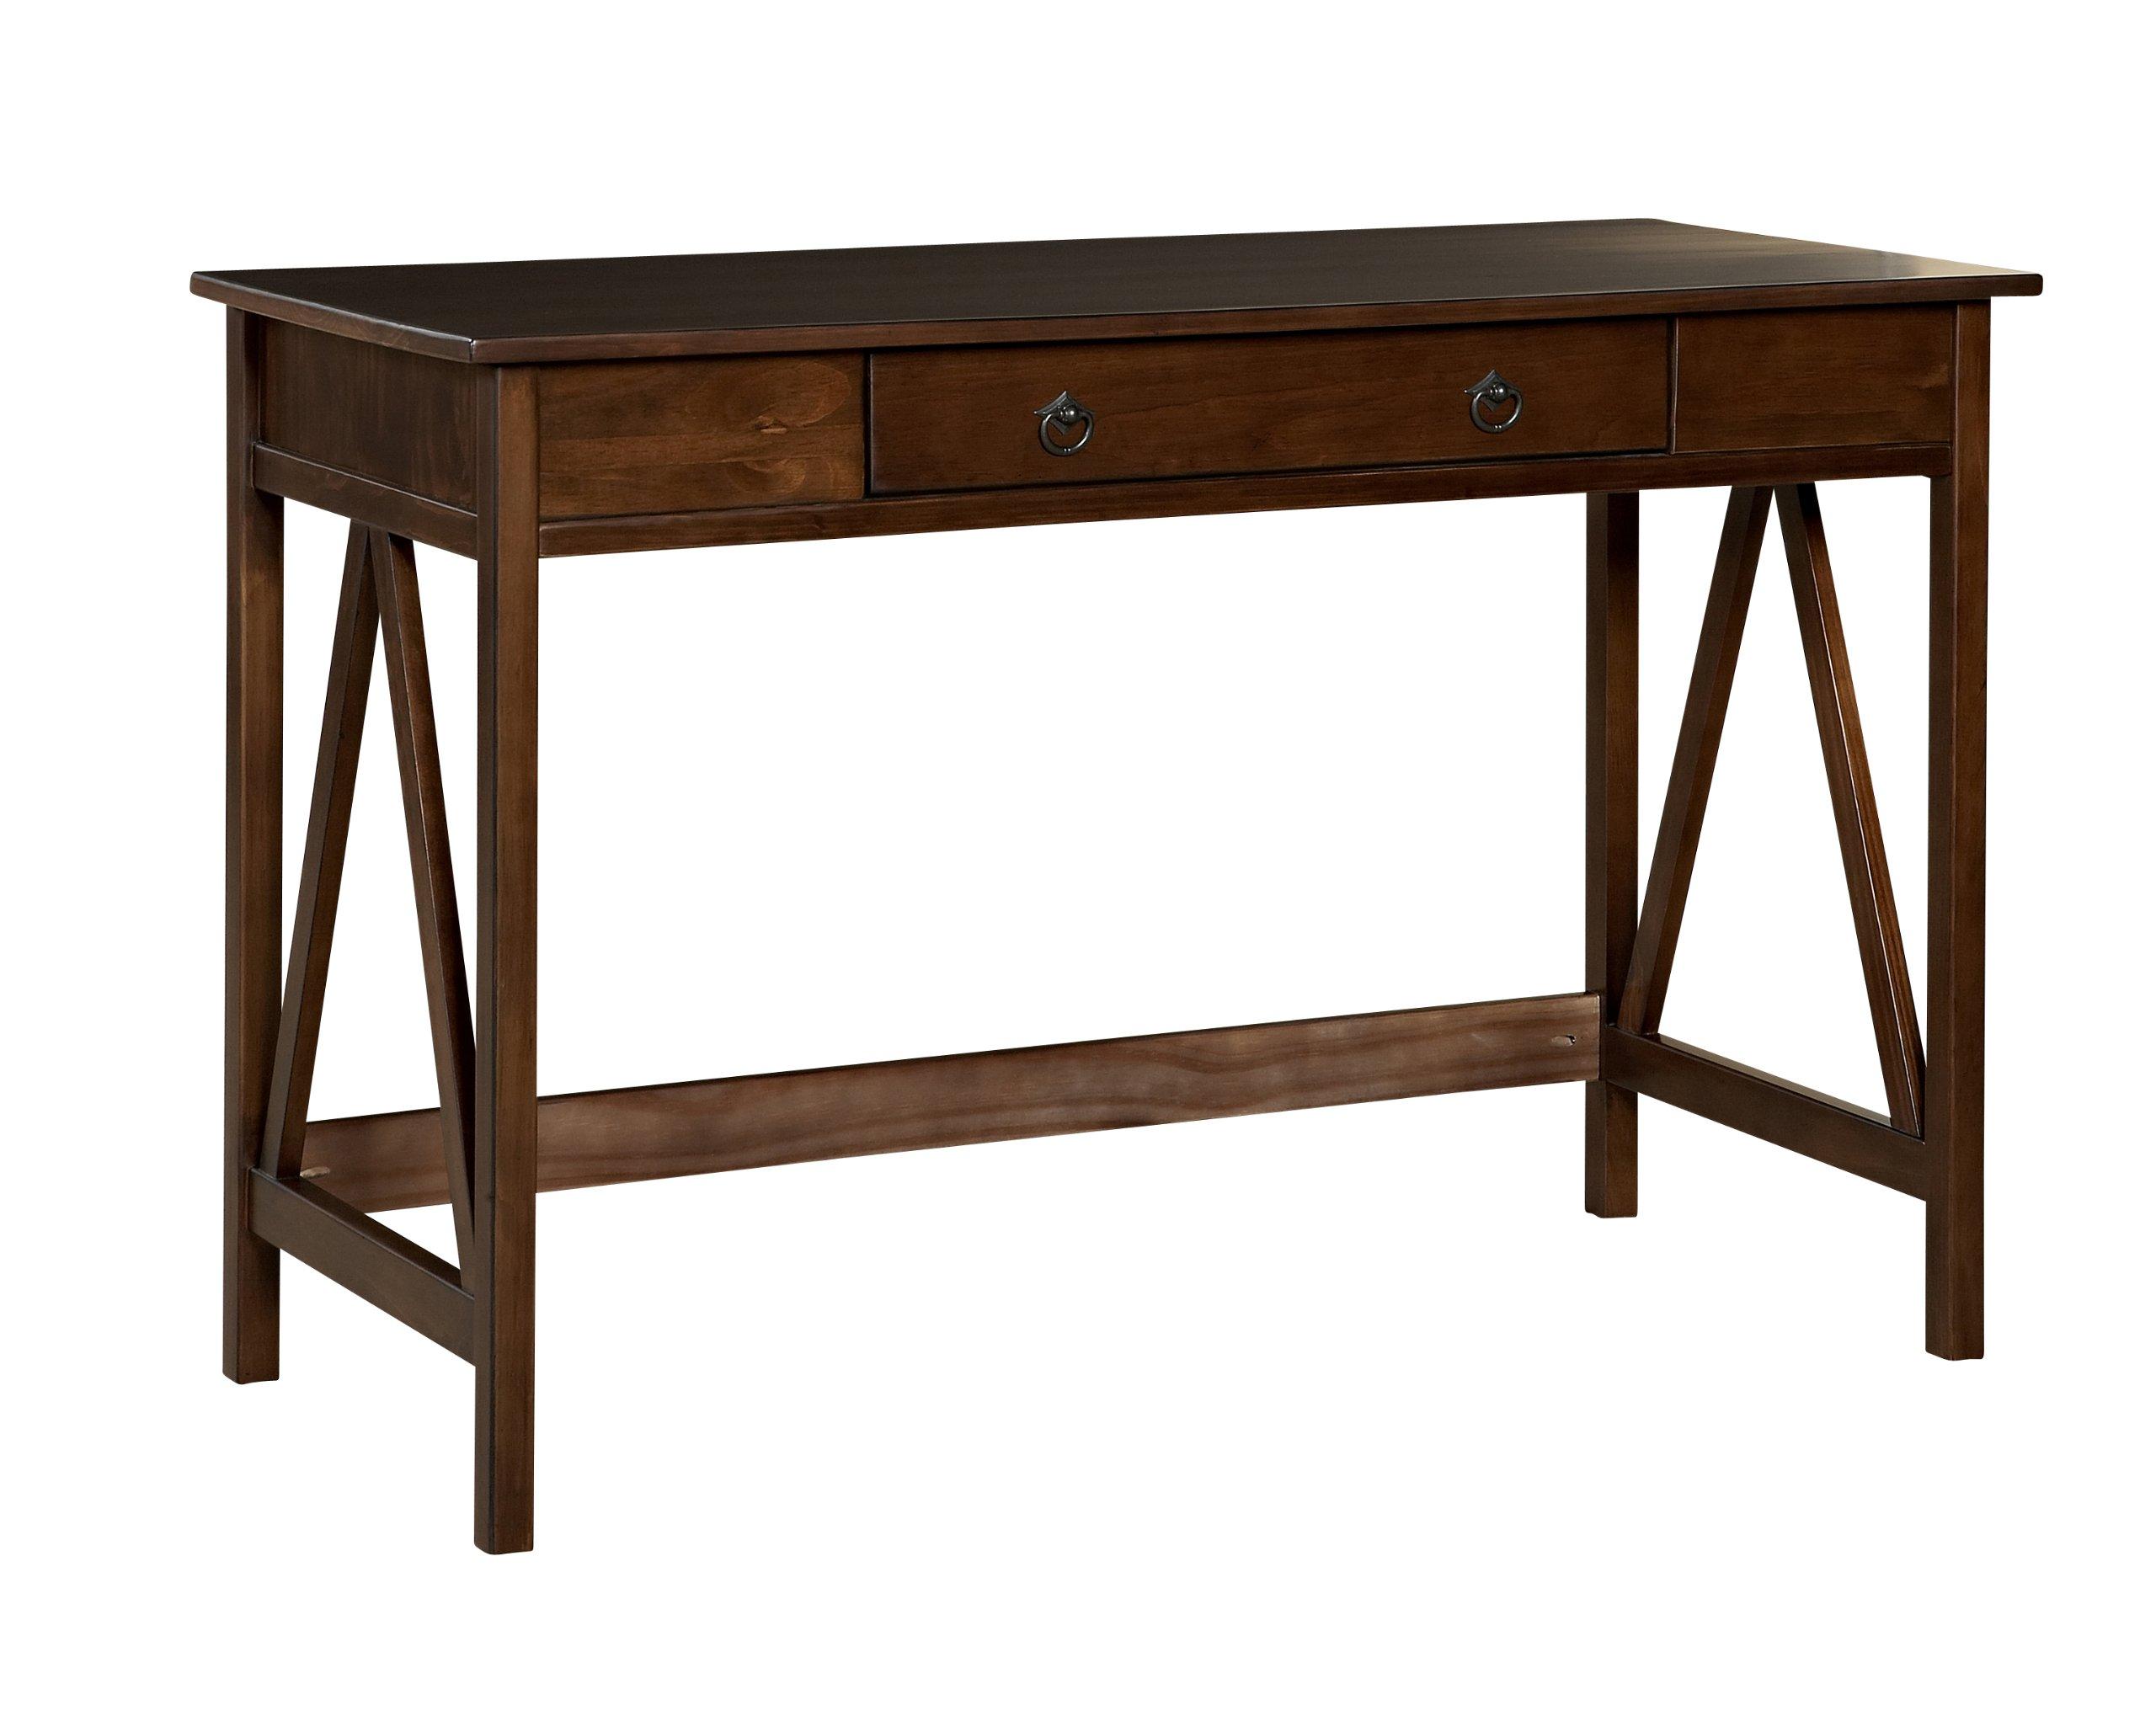 Linon Home Dcor 86154ATOB-01-KD-U Linon Home Decor Antique Tobacco Titian, 45.98'' x 20'' x 30'' Desk, by Linon Home Dcor